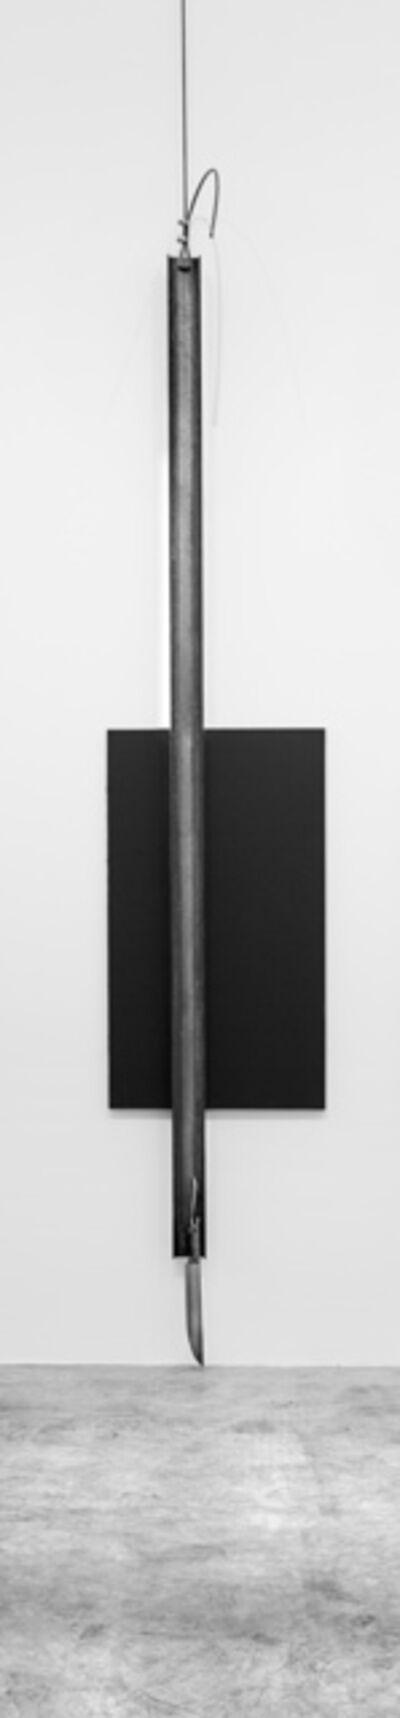 Jannis Kounellis, 'Untitled', 2012